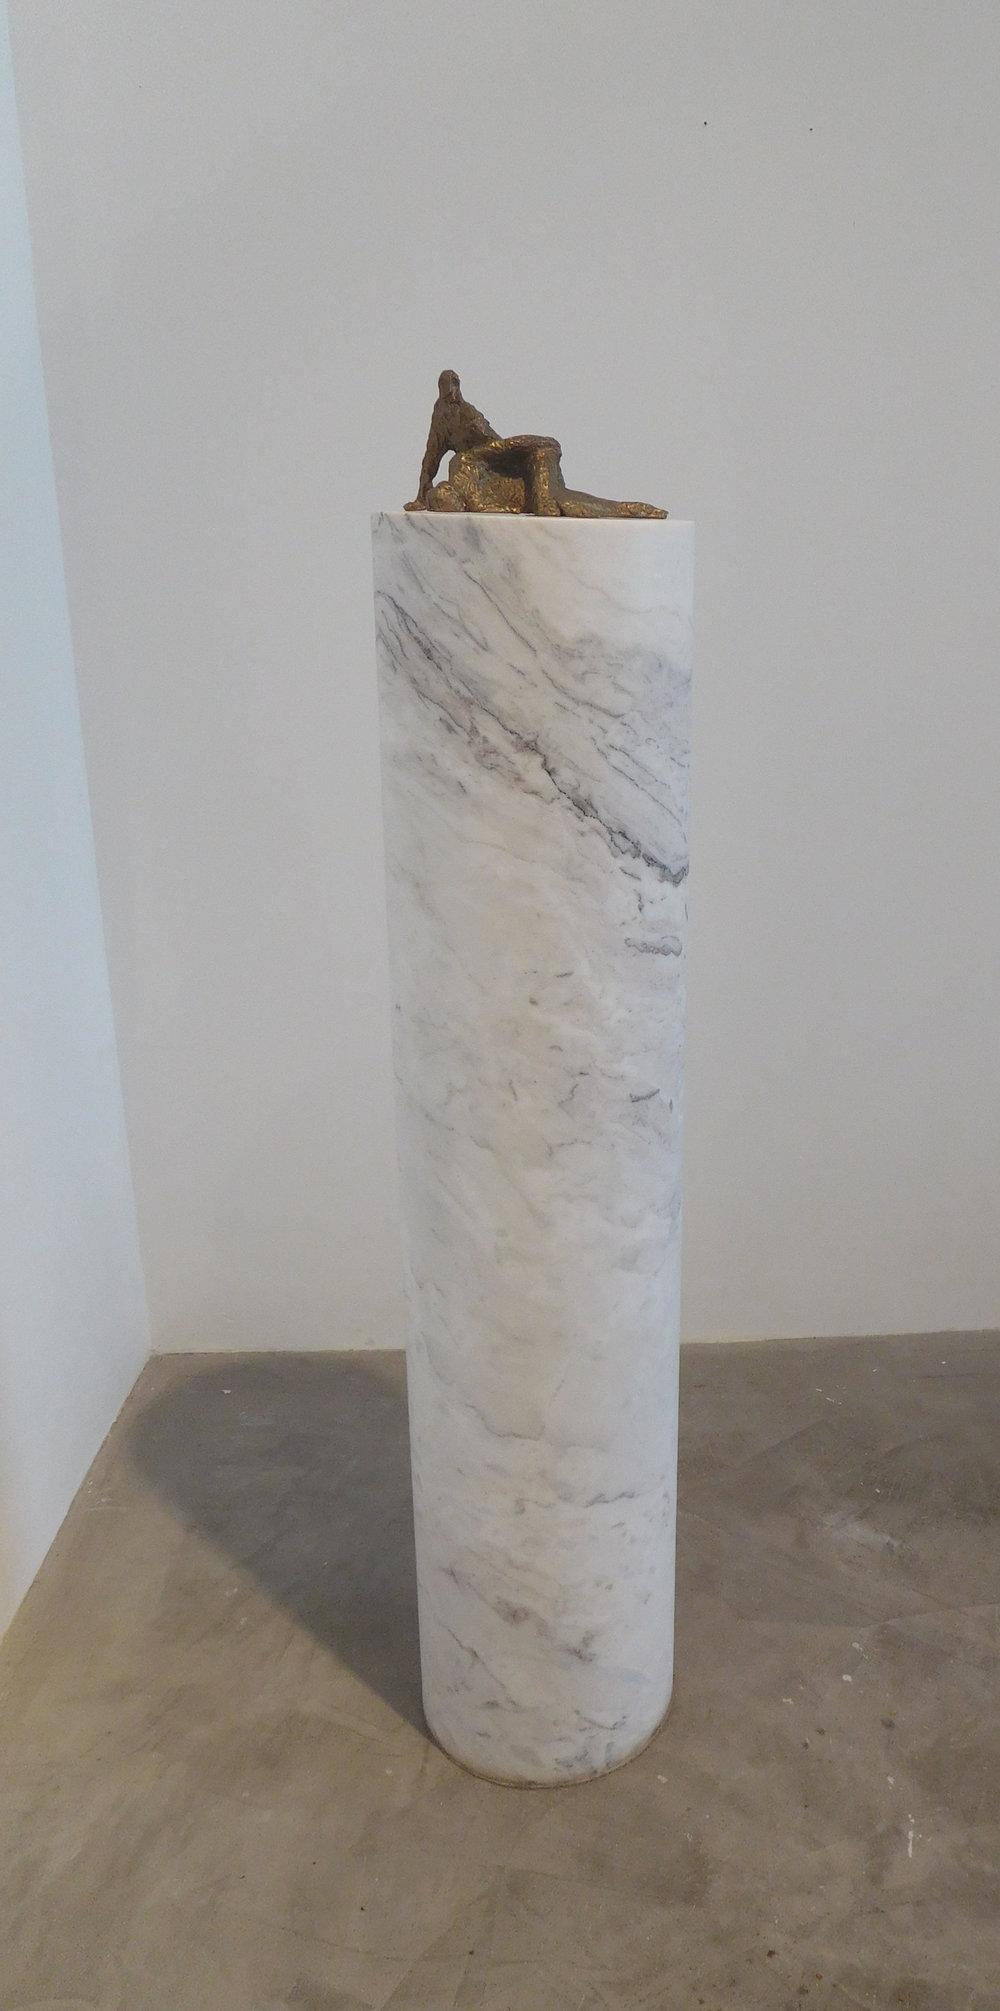 Kristian Burford, Couple Fucking, 2011 bronze on marble pedestal 117 x 25,5 cm - 46 1/8 x 10 inches